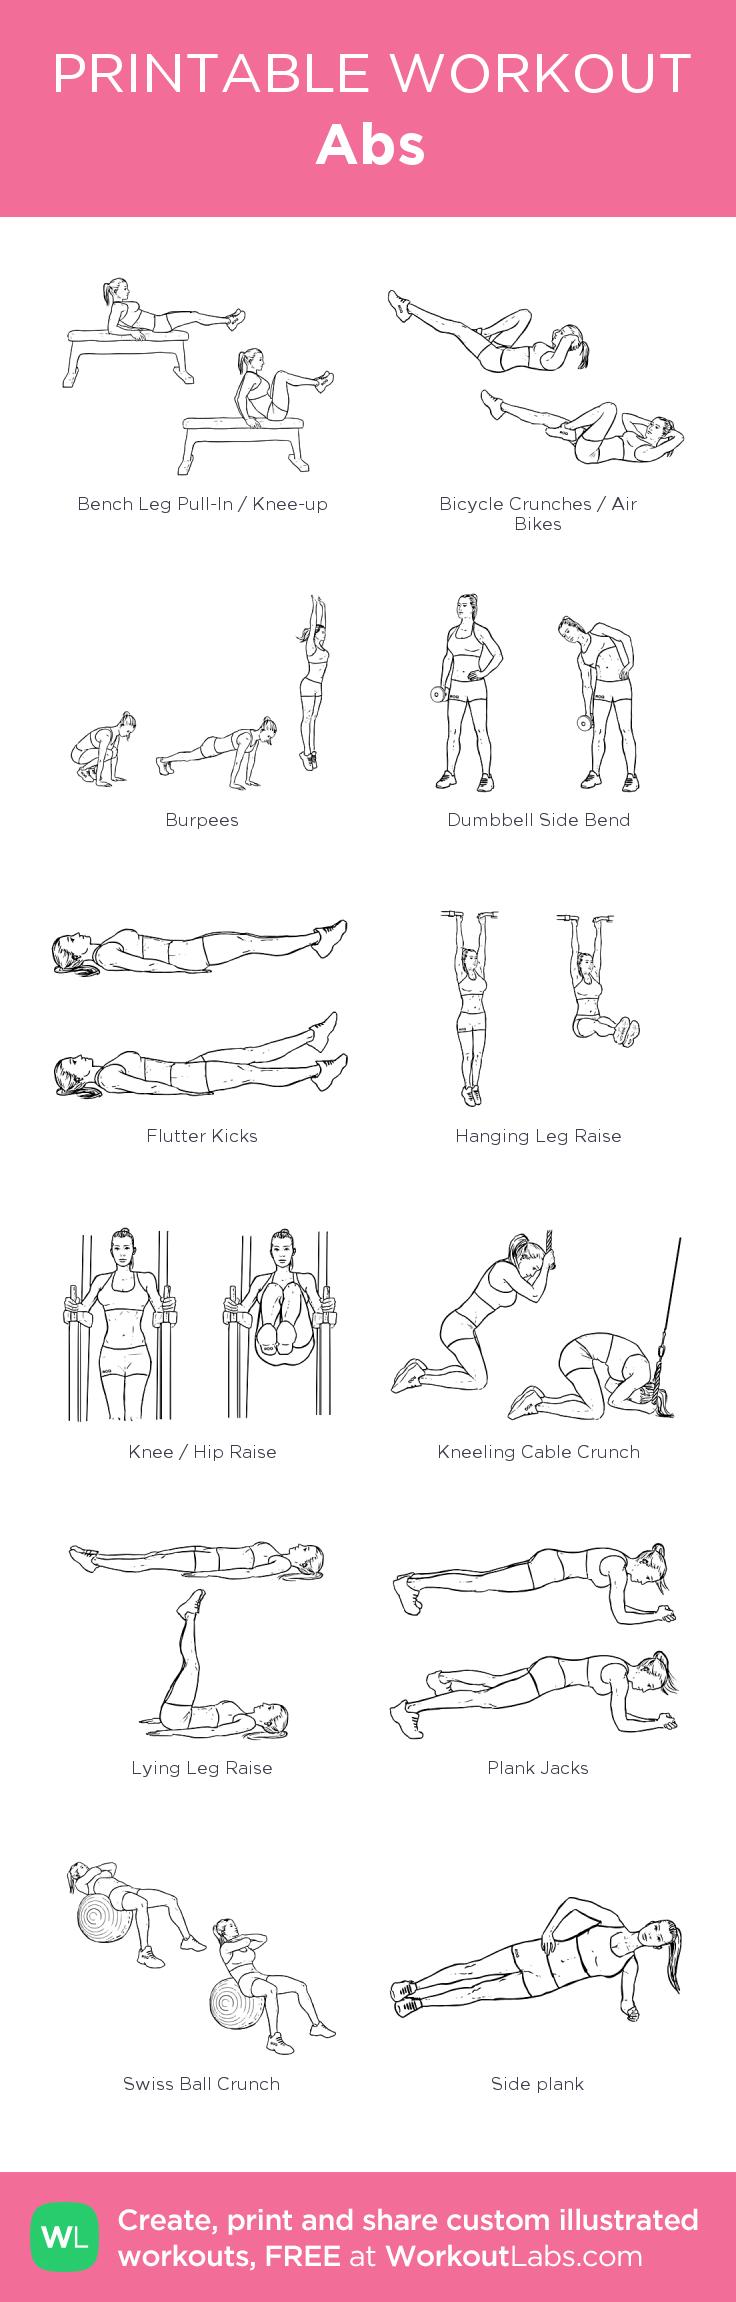 Abs: my custom printable workout by @WorkoutLabs #workoutlabs #customworkout